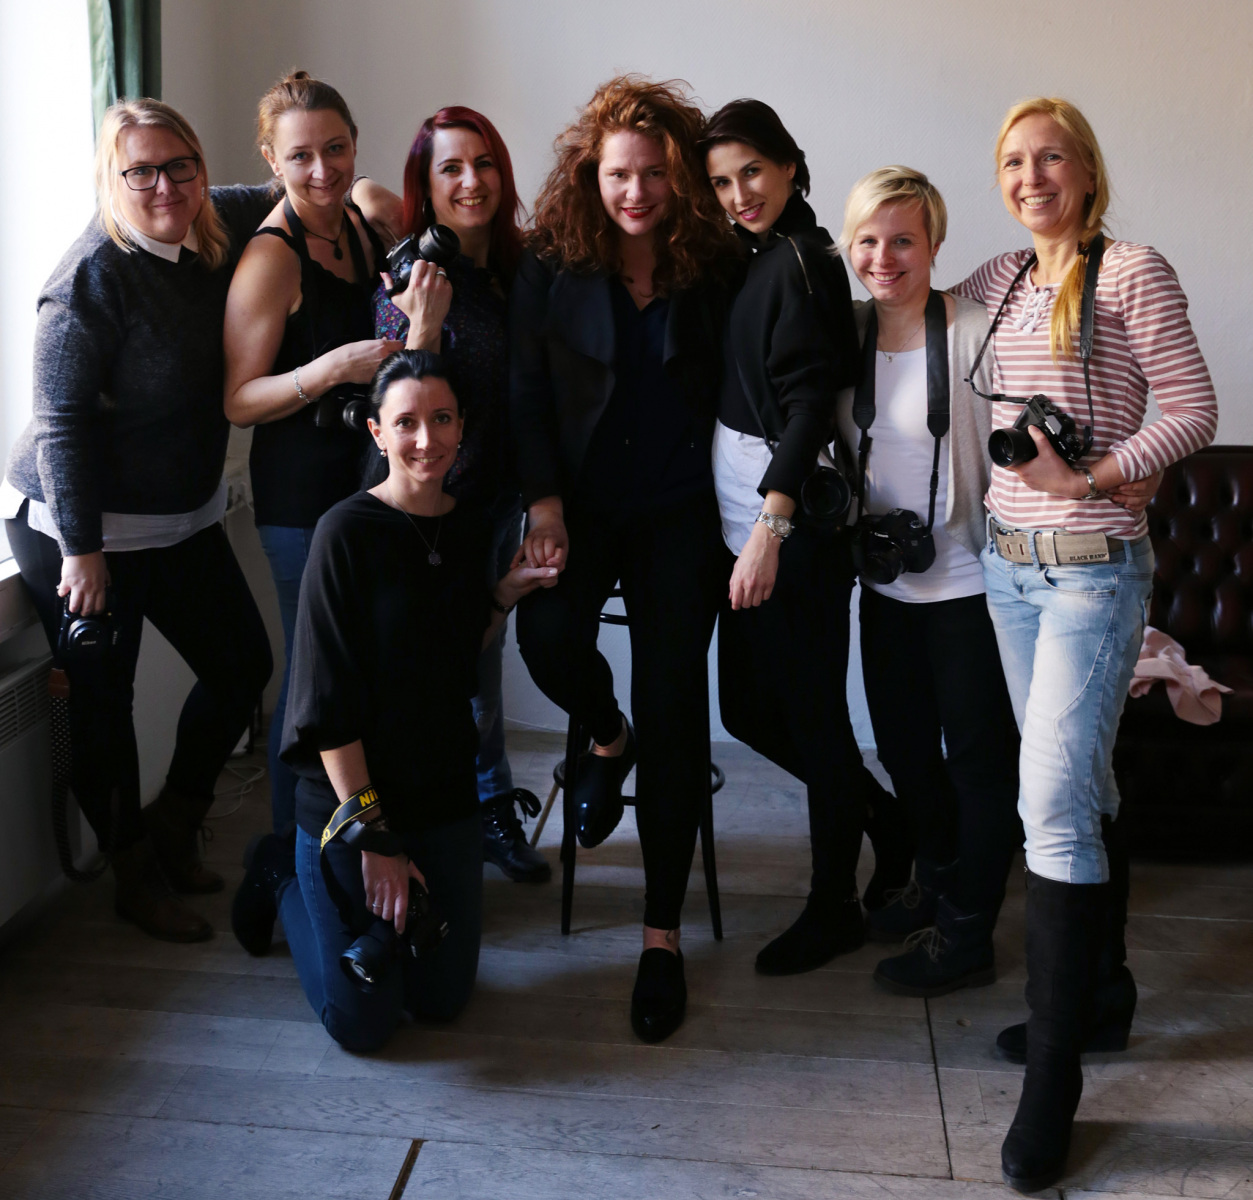 Katerina_Janisova_Masterclass_Workshop_Fotokurz-4